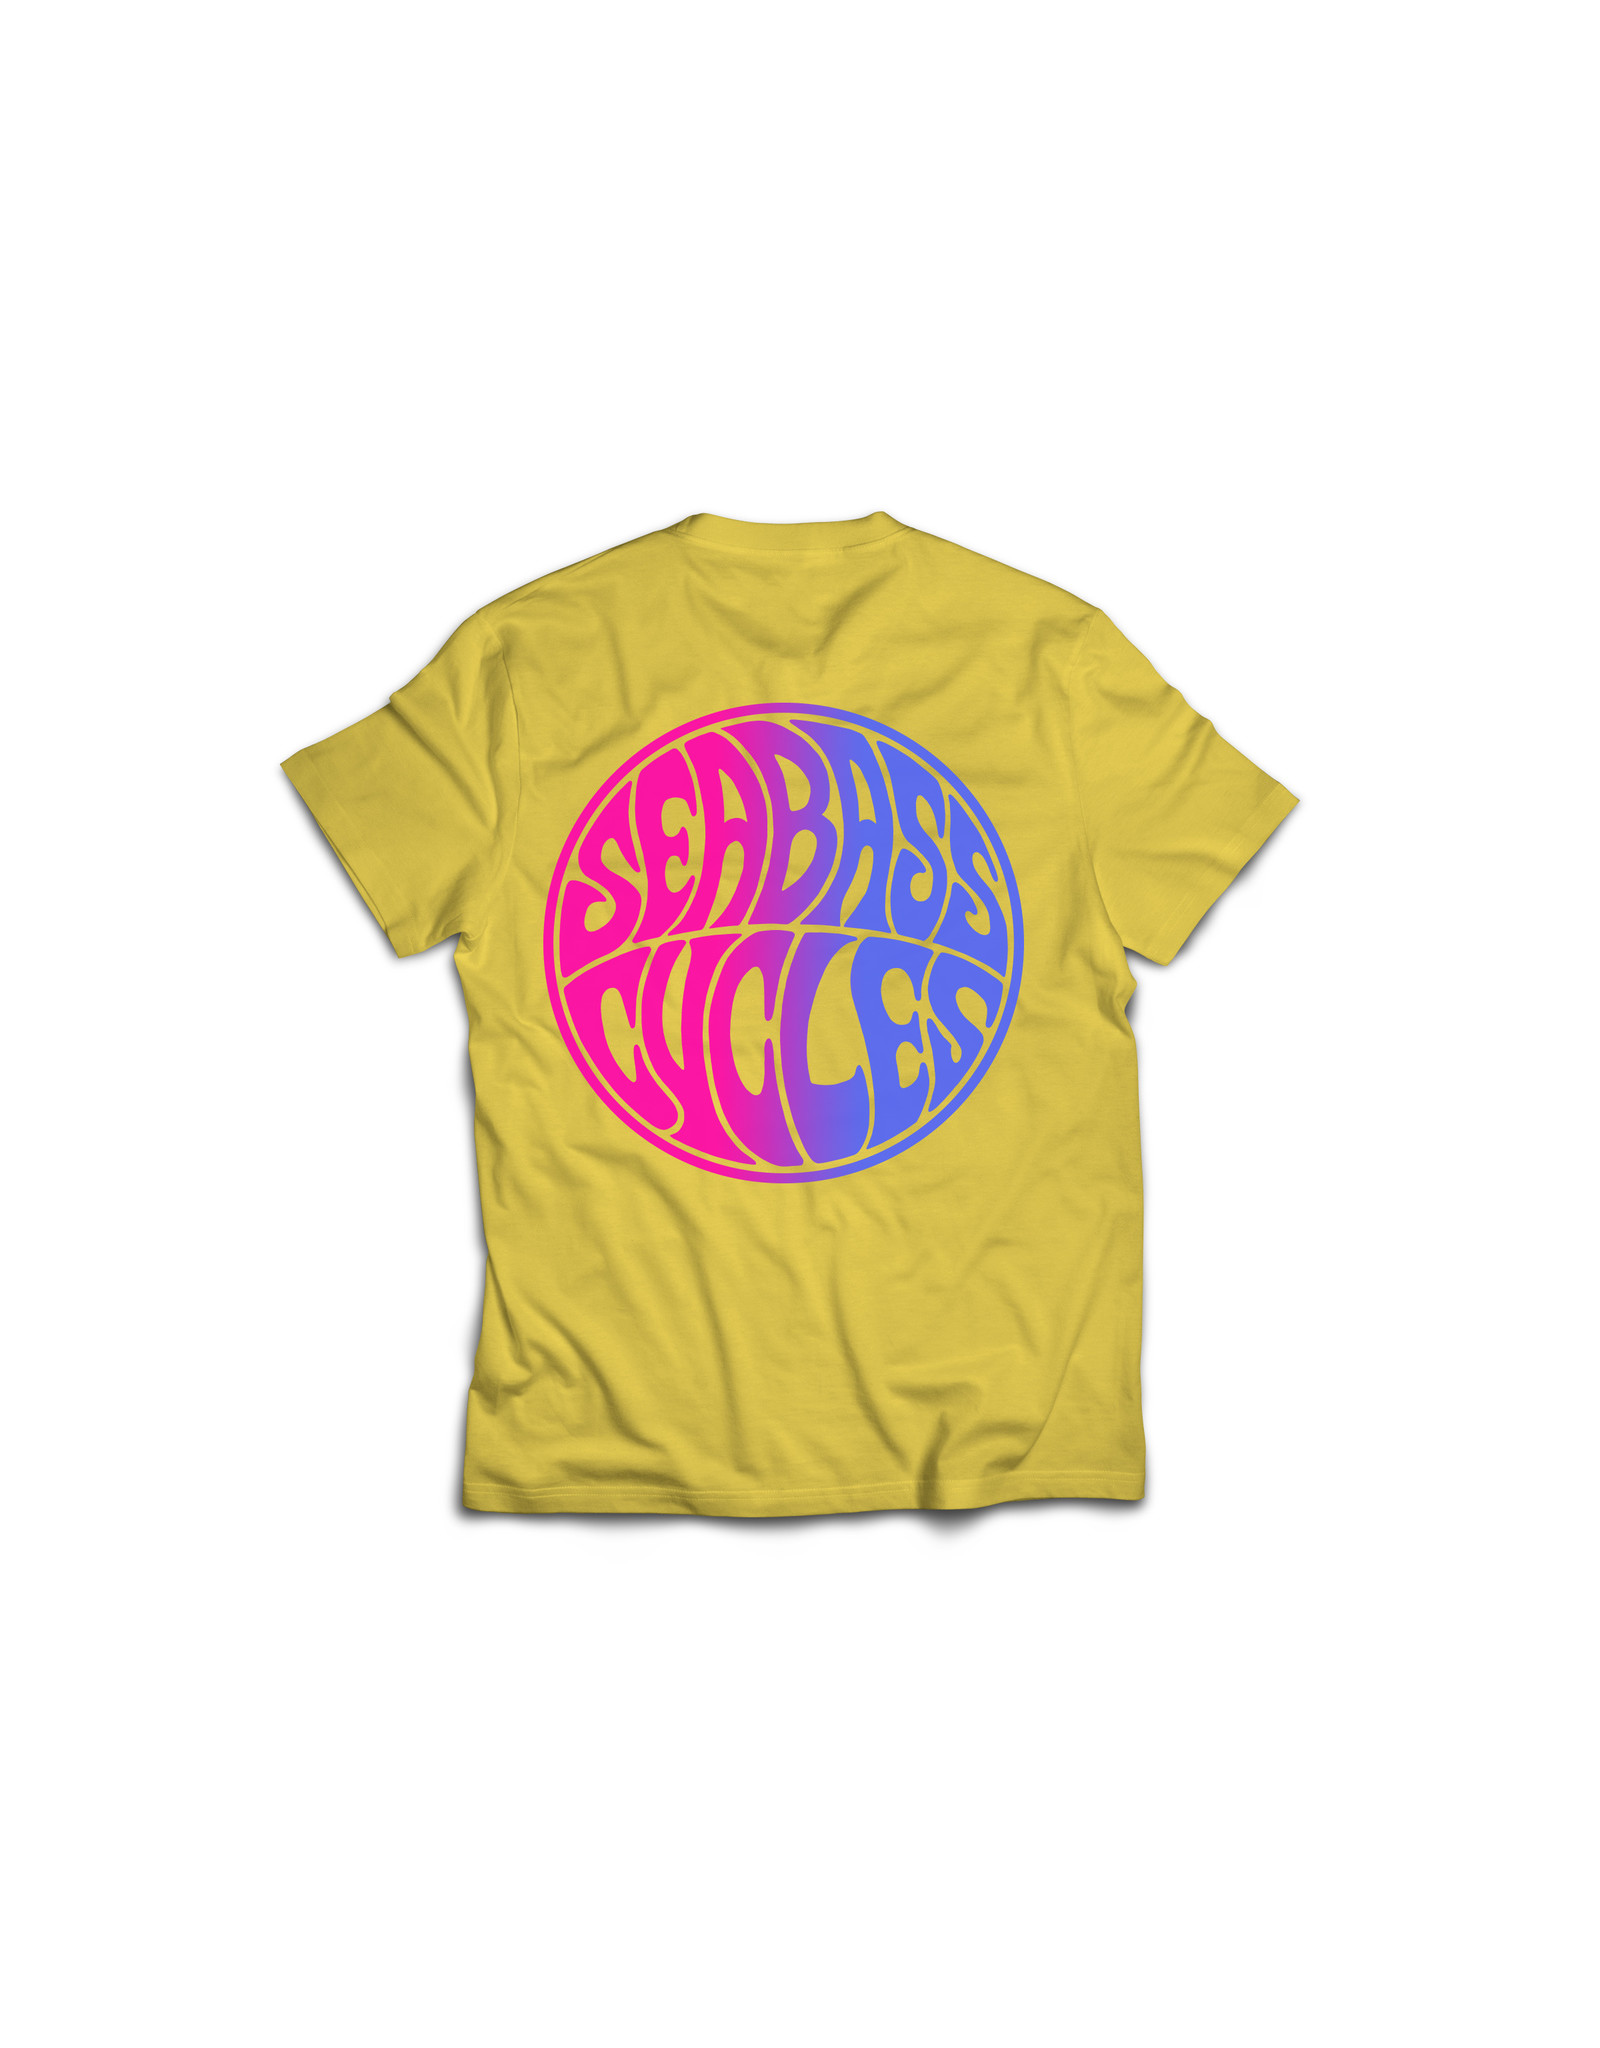 Seabass Cycles Seabass Cycles - Circle Logo Kids TShirt - Yellow